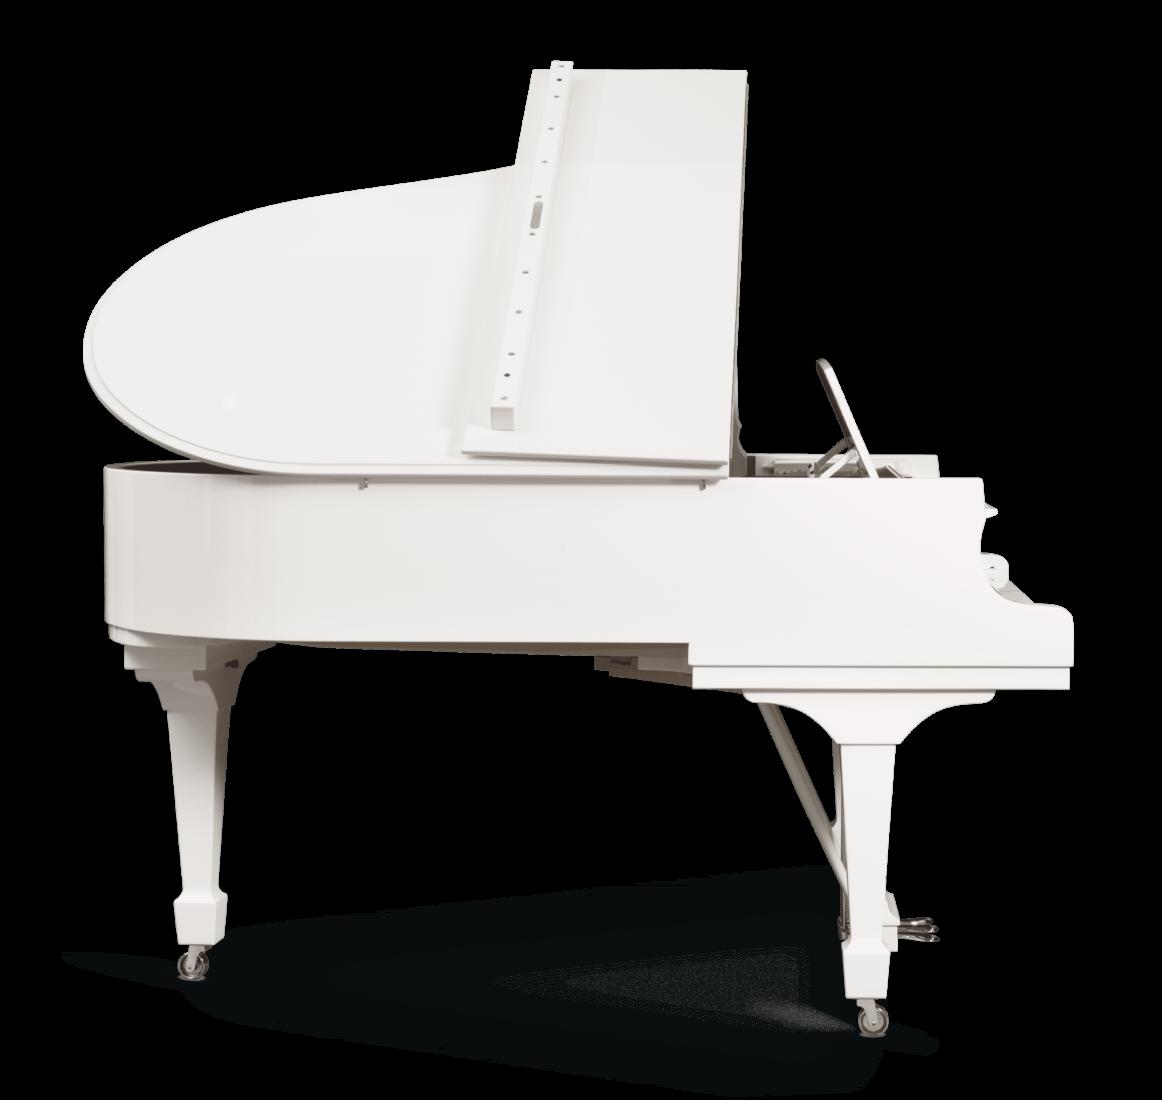 piano de cola Steinway & Sons Spirio O180 Chrome plano general lateral 2